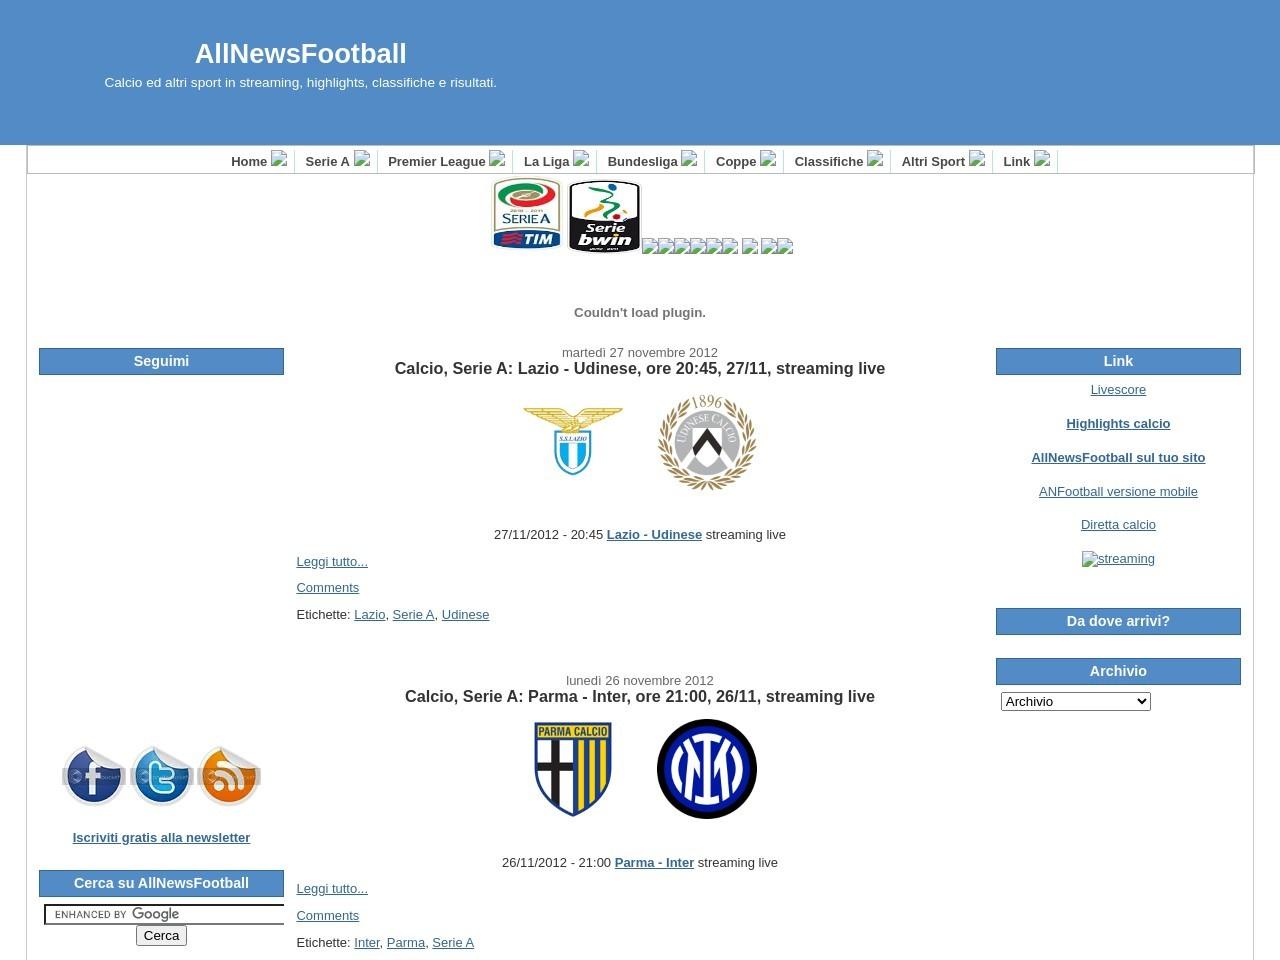 allnewsfootball